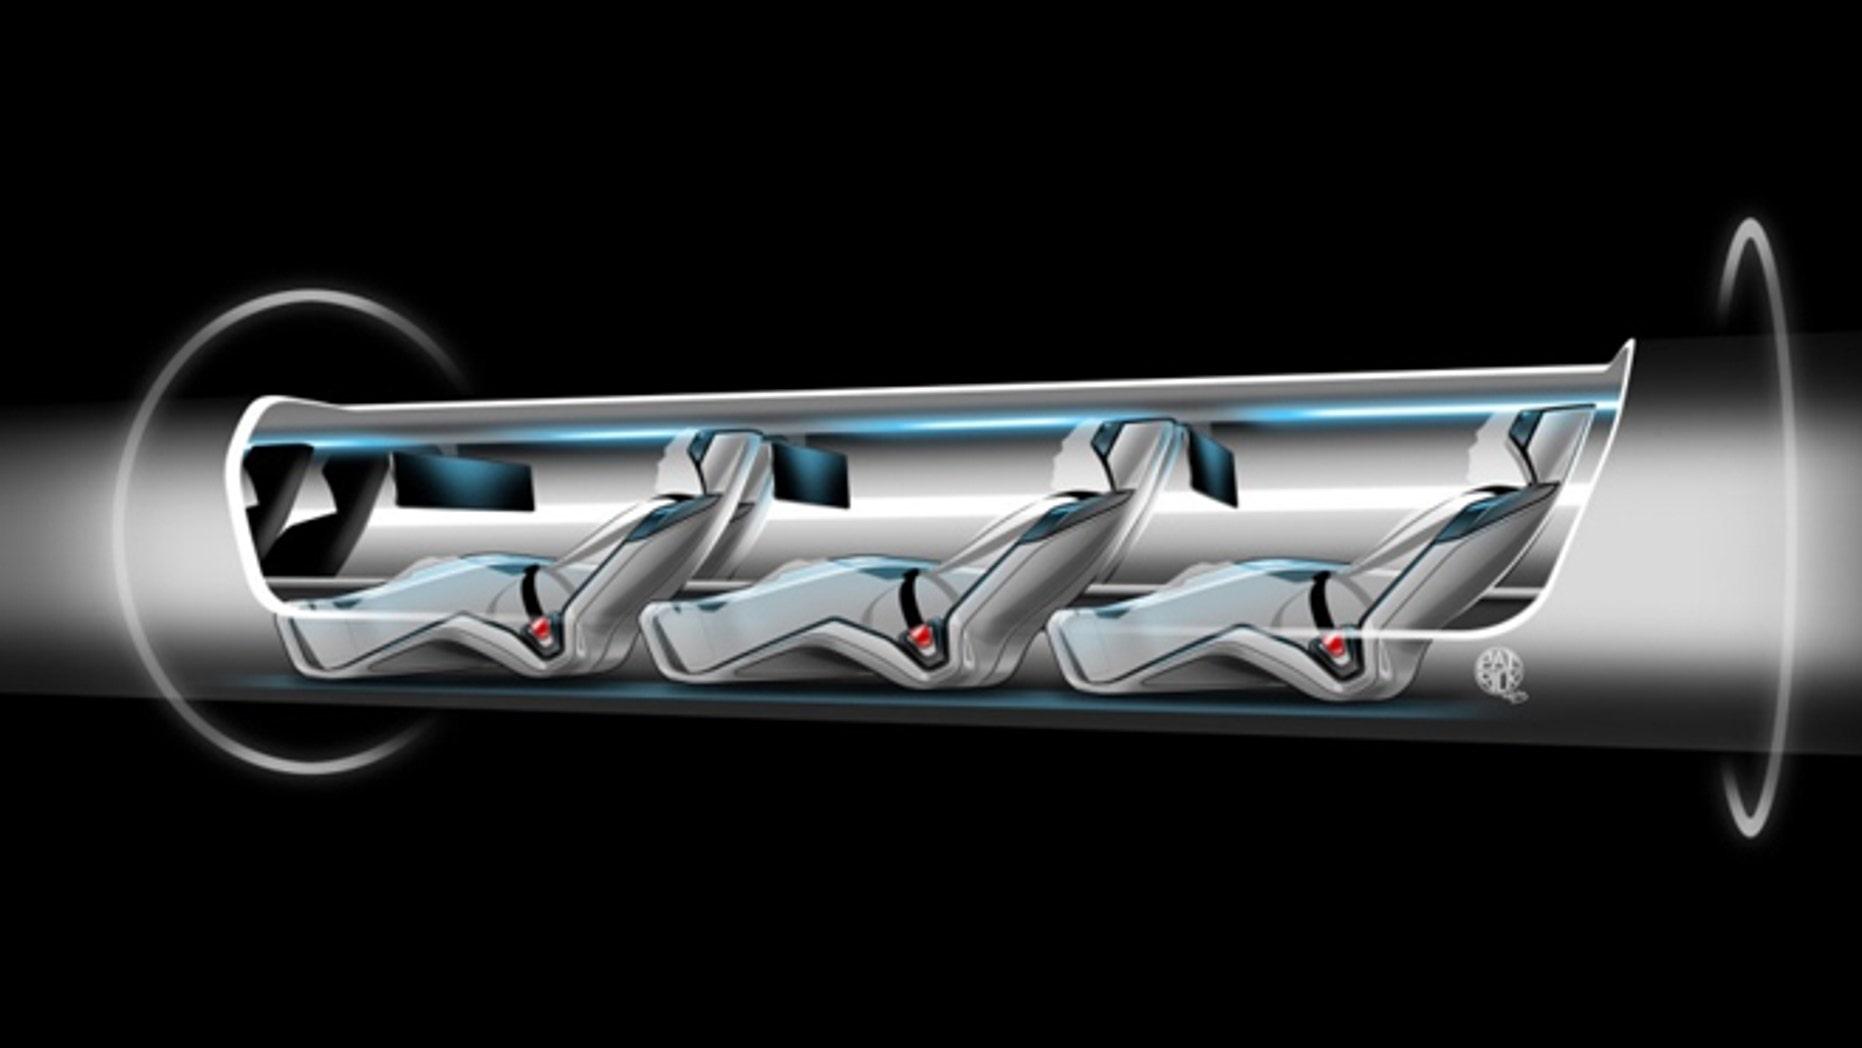 Aug. 12, 2013: An artist's concept of Elon Musk's Hyperloop passenger capsule, cutaway to show passengers onboard.